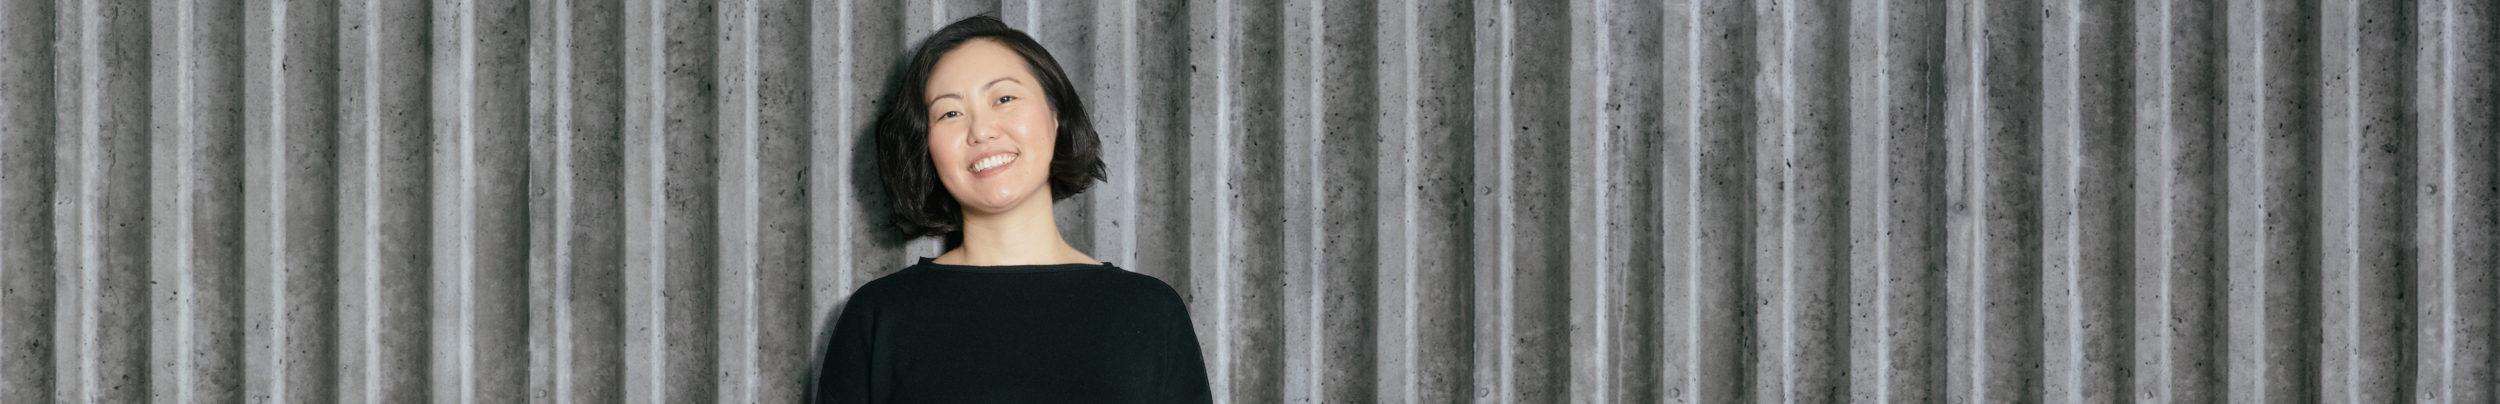 office of mcfarlane biggar architects + designers, select, Elaine Tong